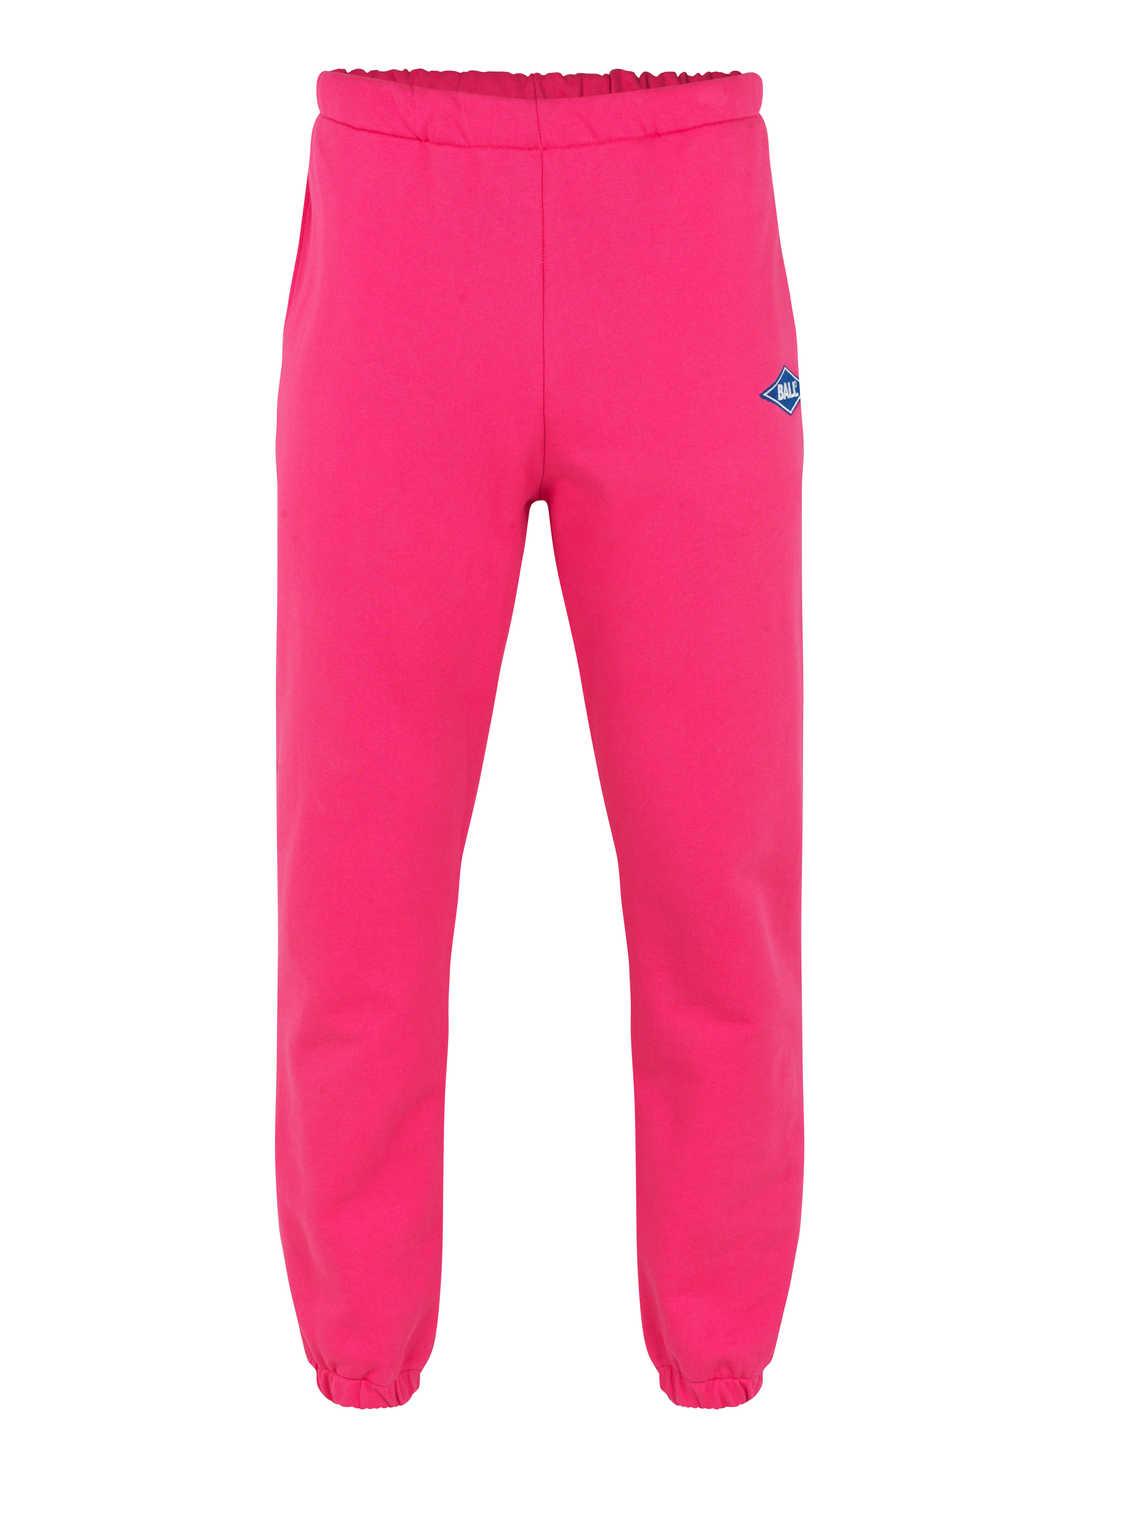 BALL Original Rimini sweatpants, bright pink, xx-small